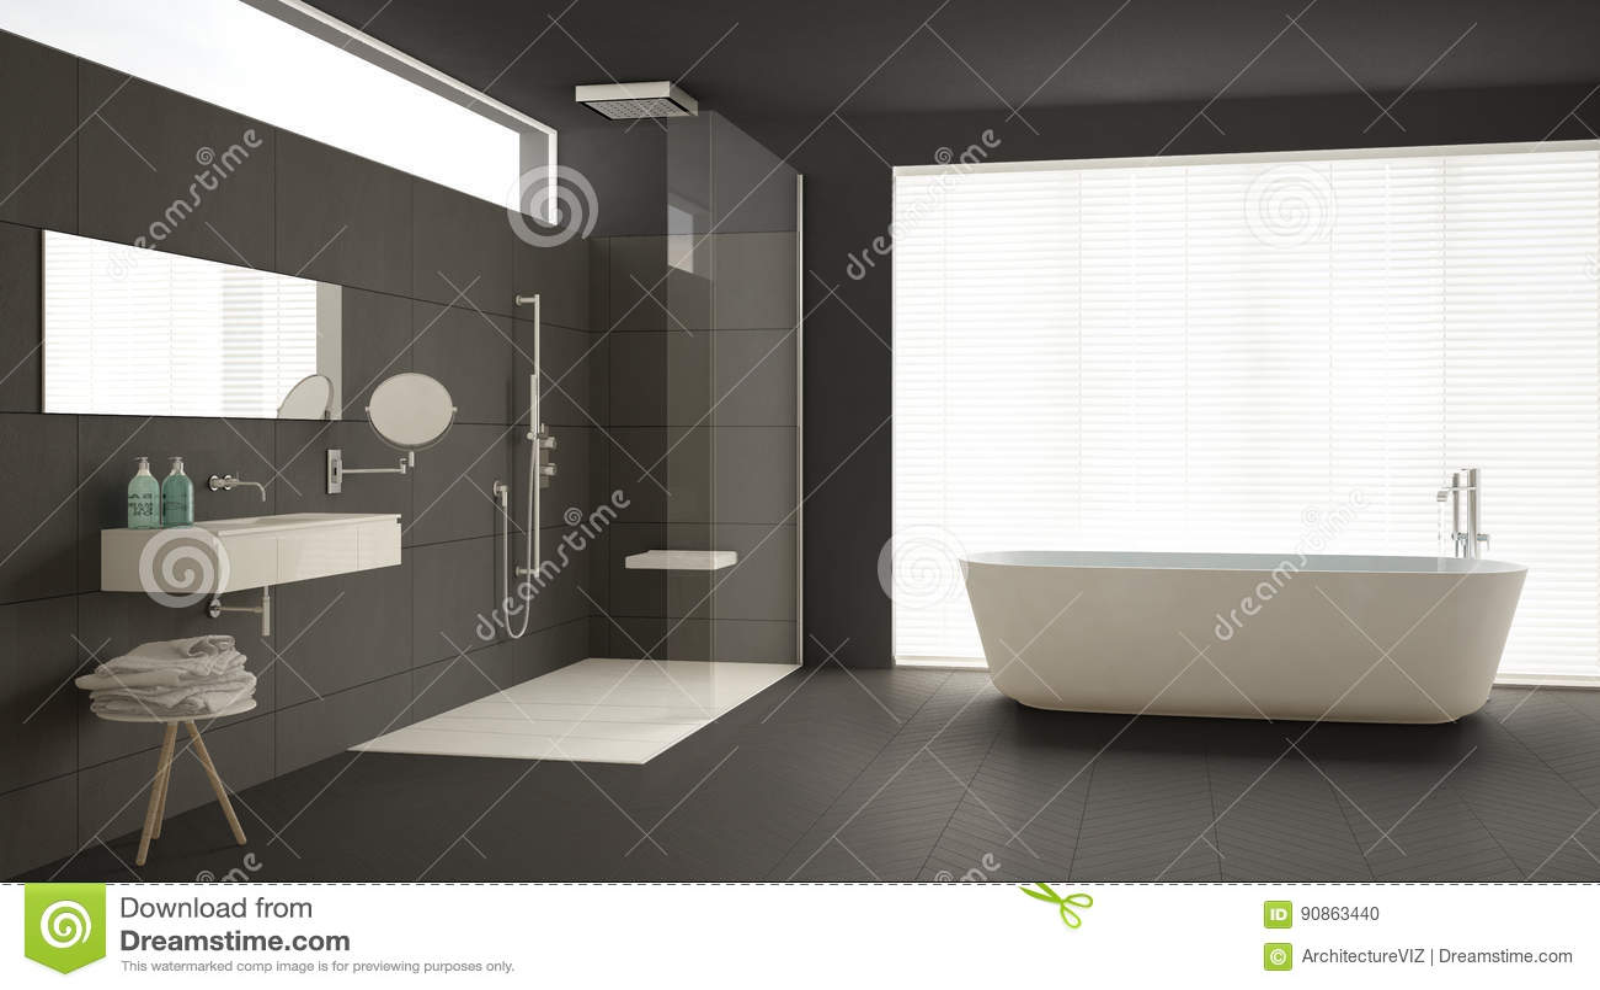 Download Minimalist Bathroom With Bathtub And Shower Parquet Floor M Stock Photo